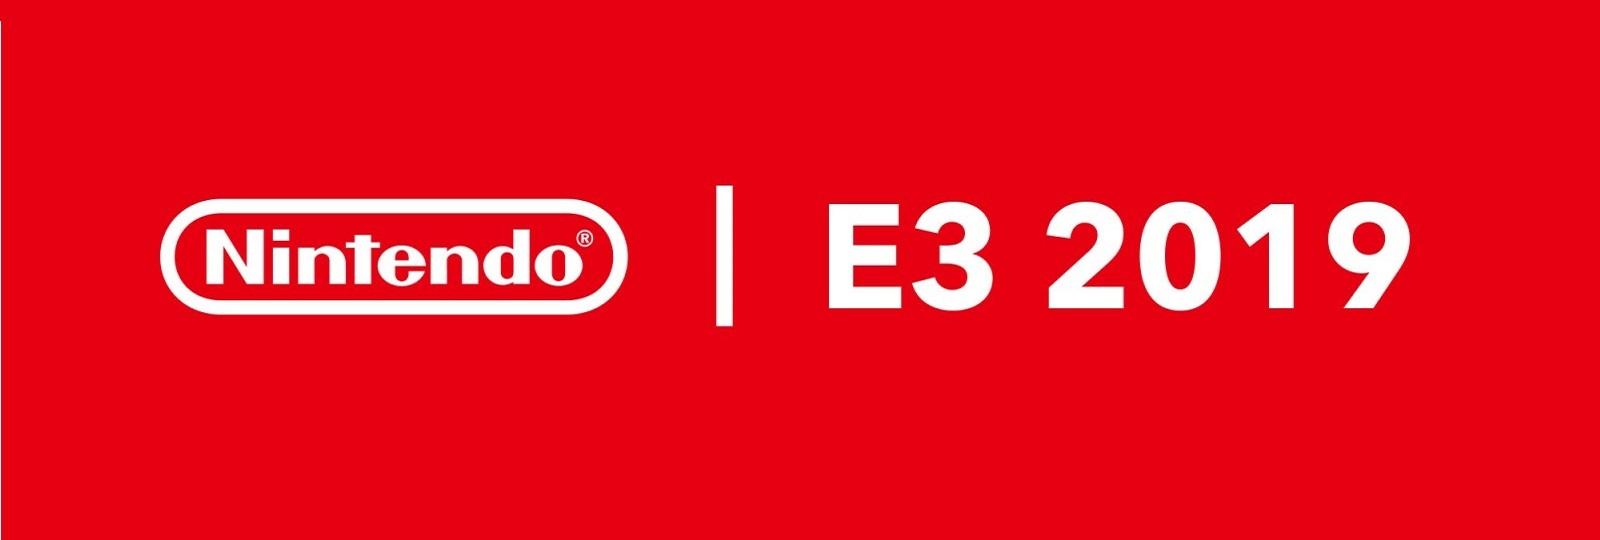 Nintendo; logo